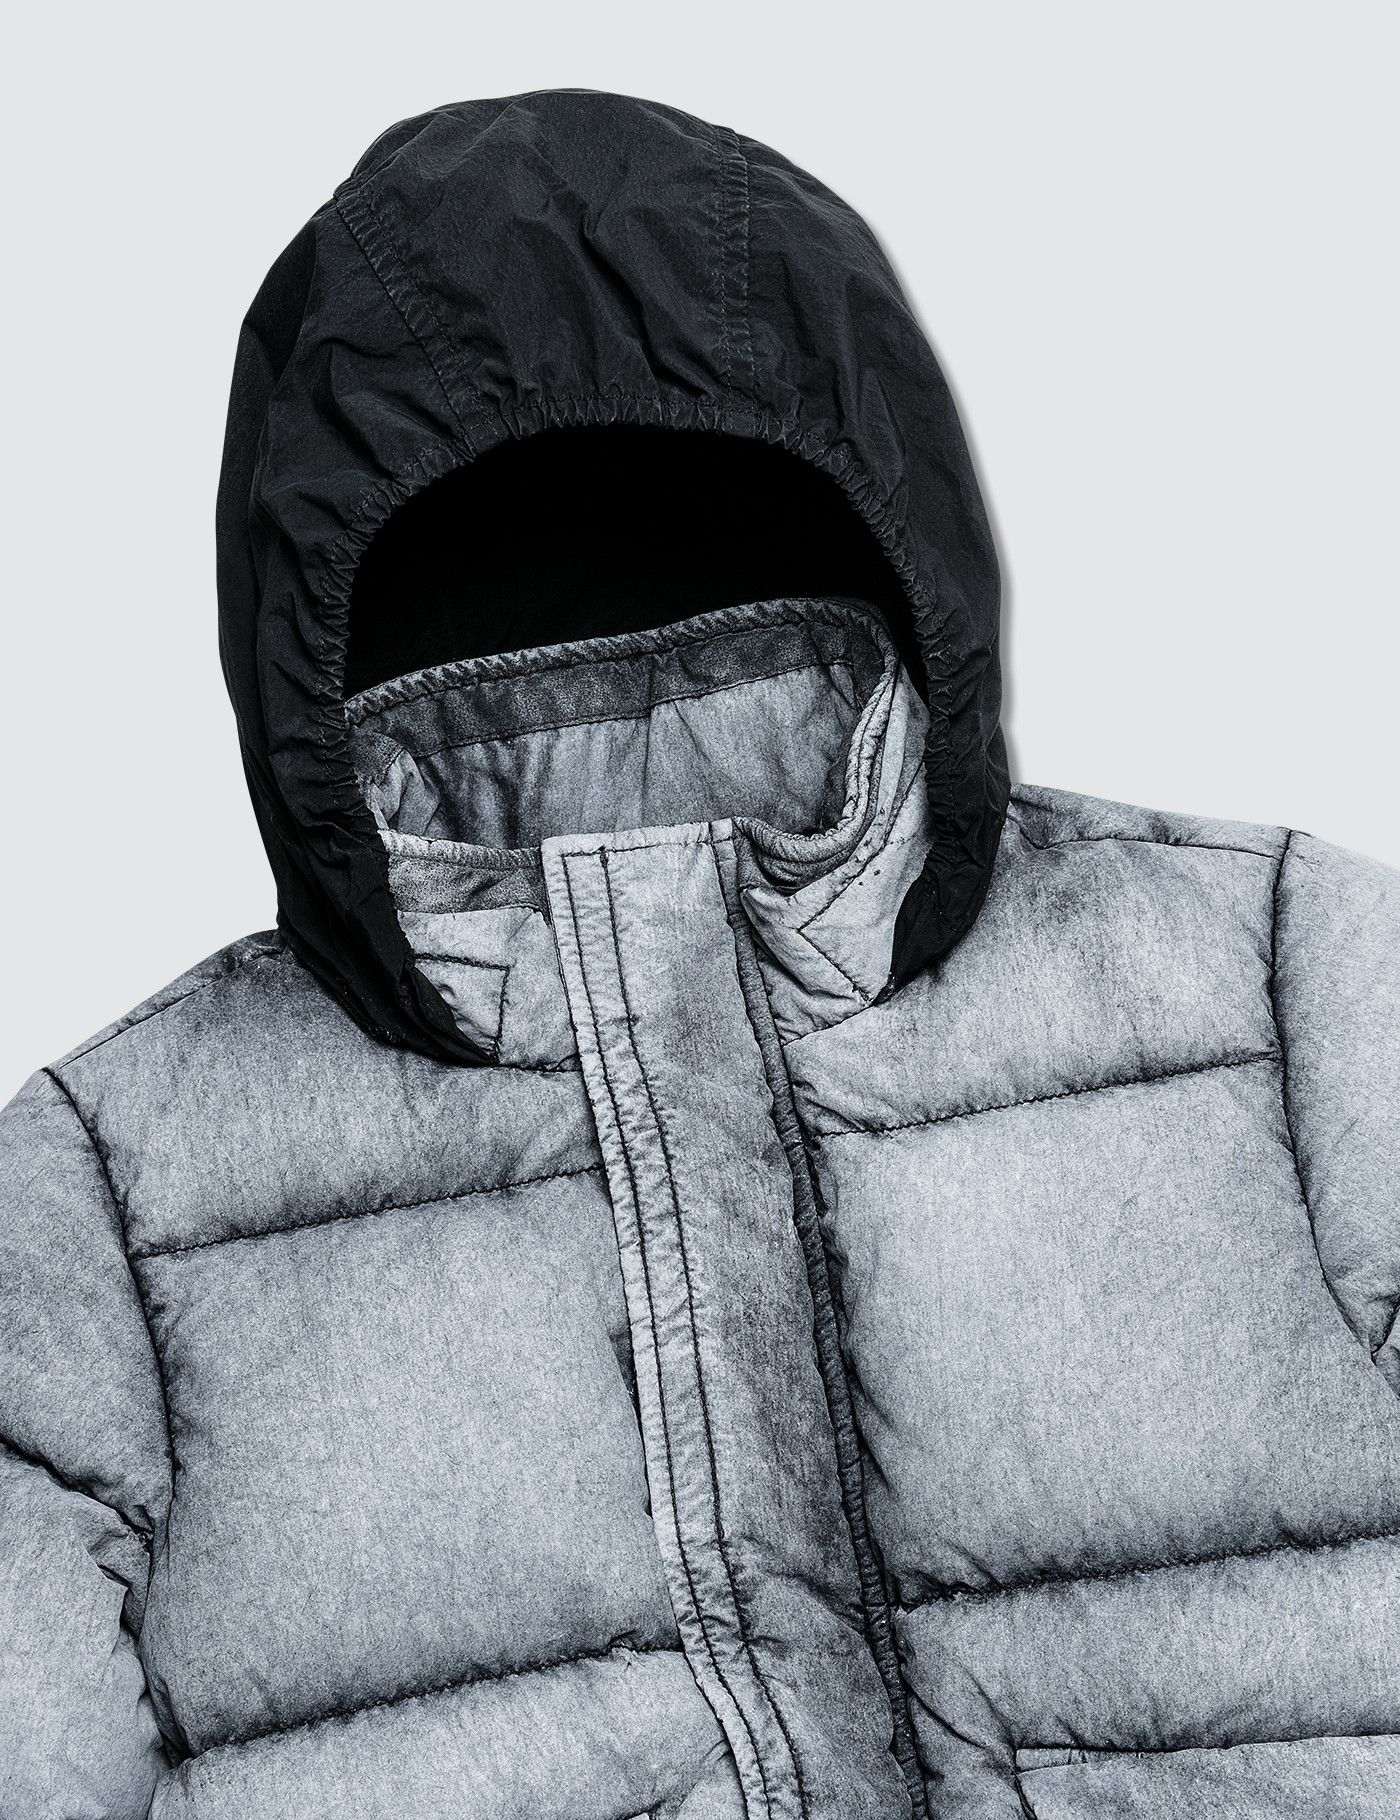 Stone Island Degrade Puffer Jacket With Packable Hoodie Kids Sponsored Kids Hoodie Puffer Jackets Jackets [ 1820 x 1400 Pixel ]